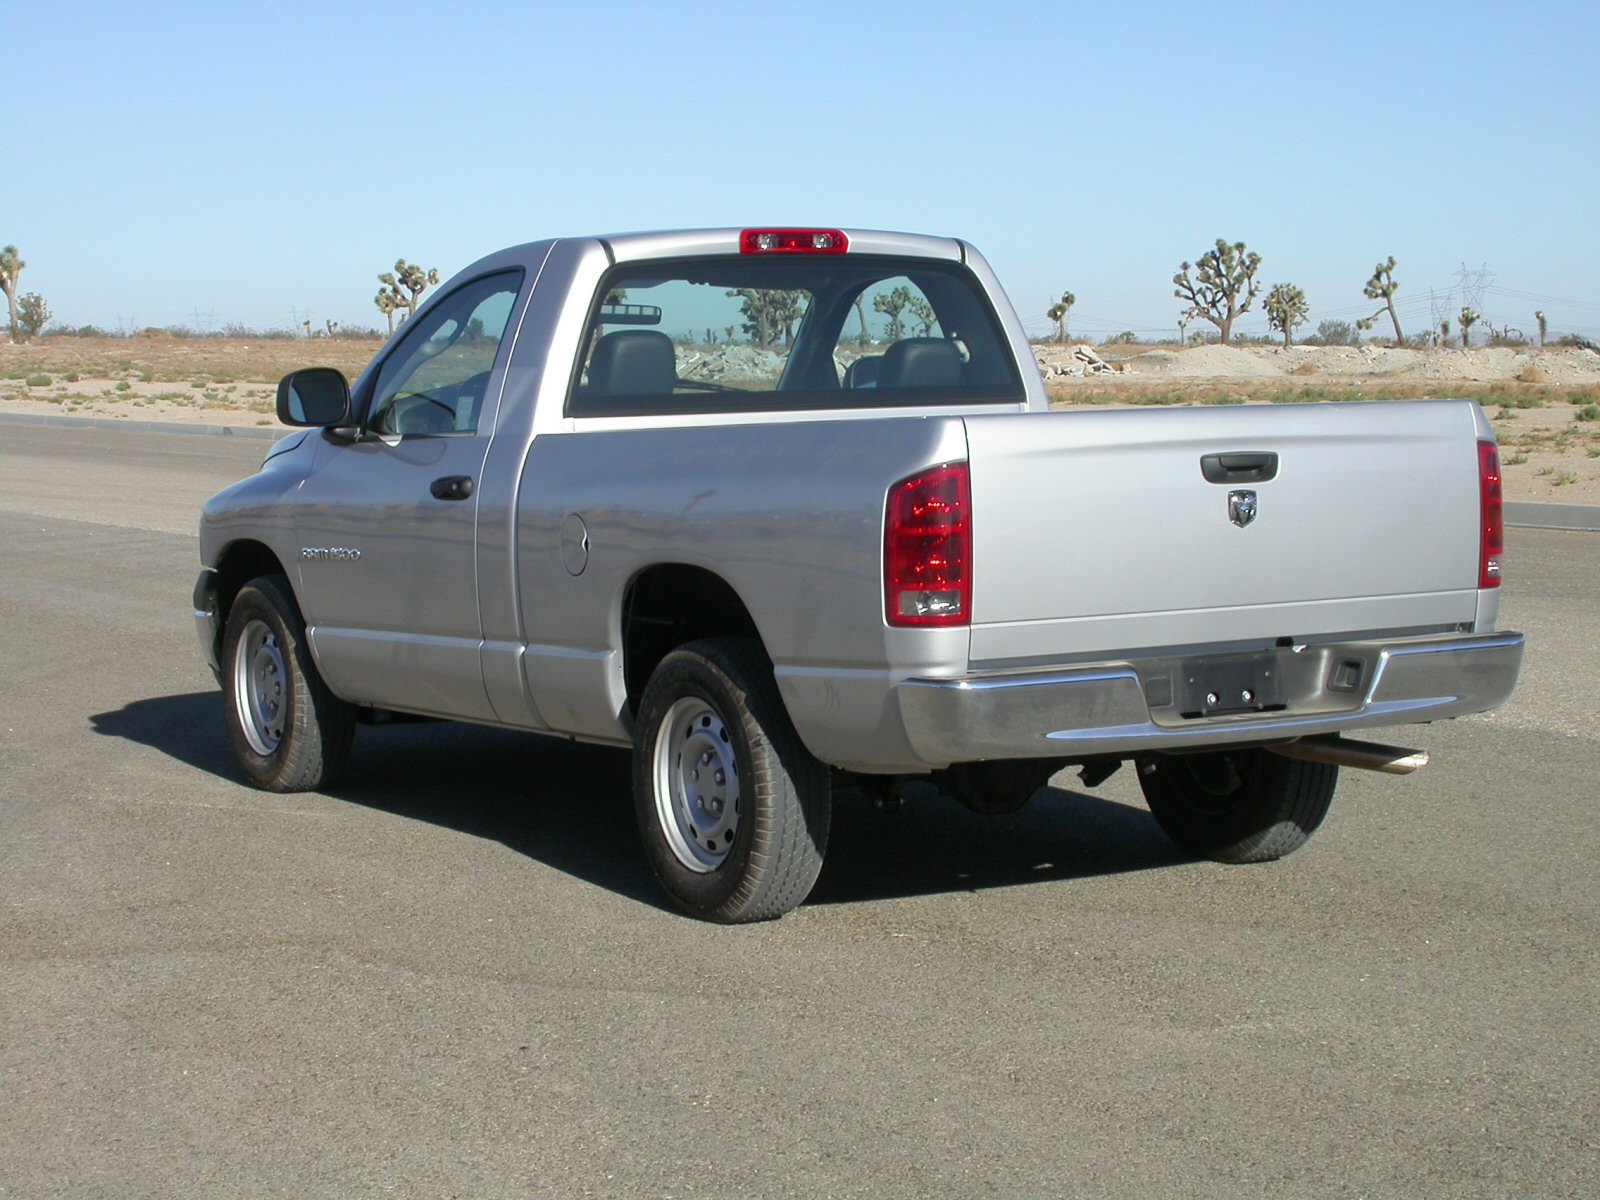 2005 Dodge Ram Pickup 1500 Information And Photos Zombiedrive Silver Hemi 21